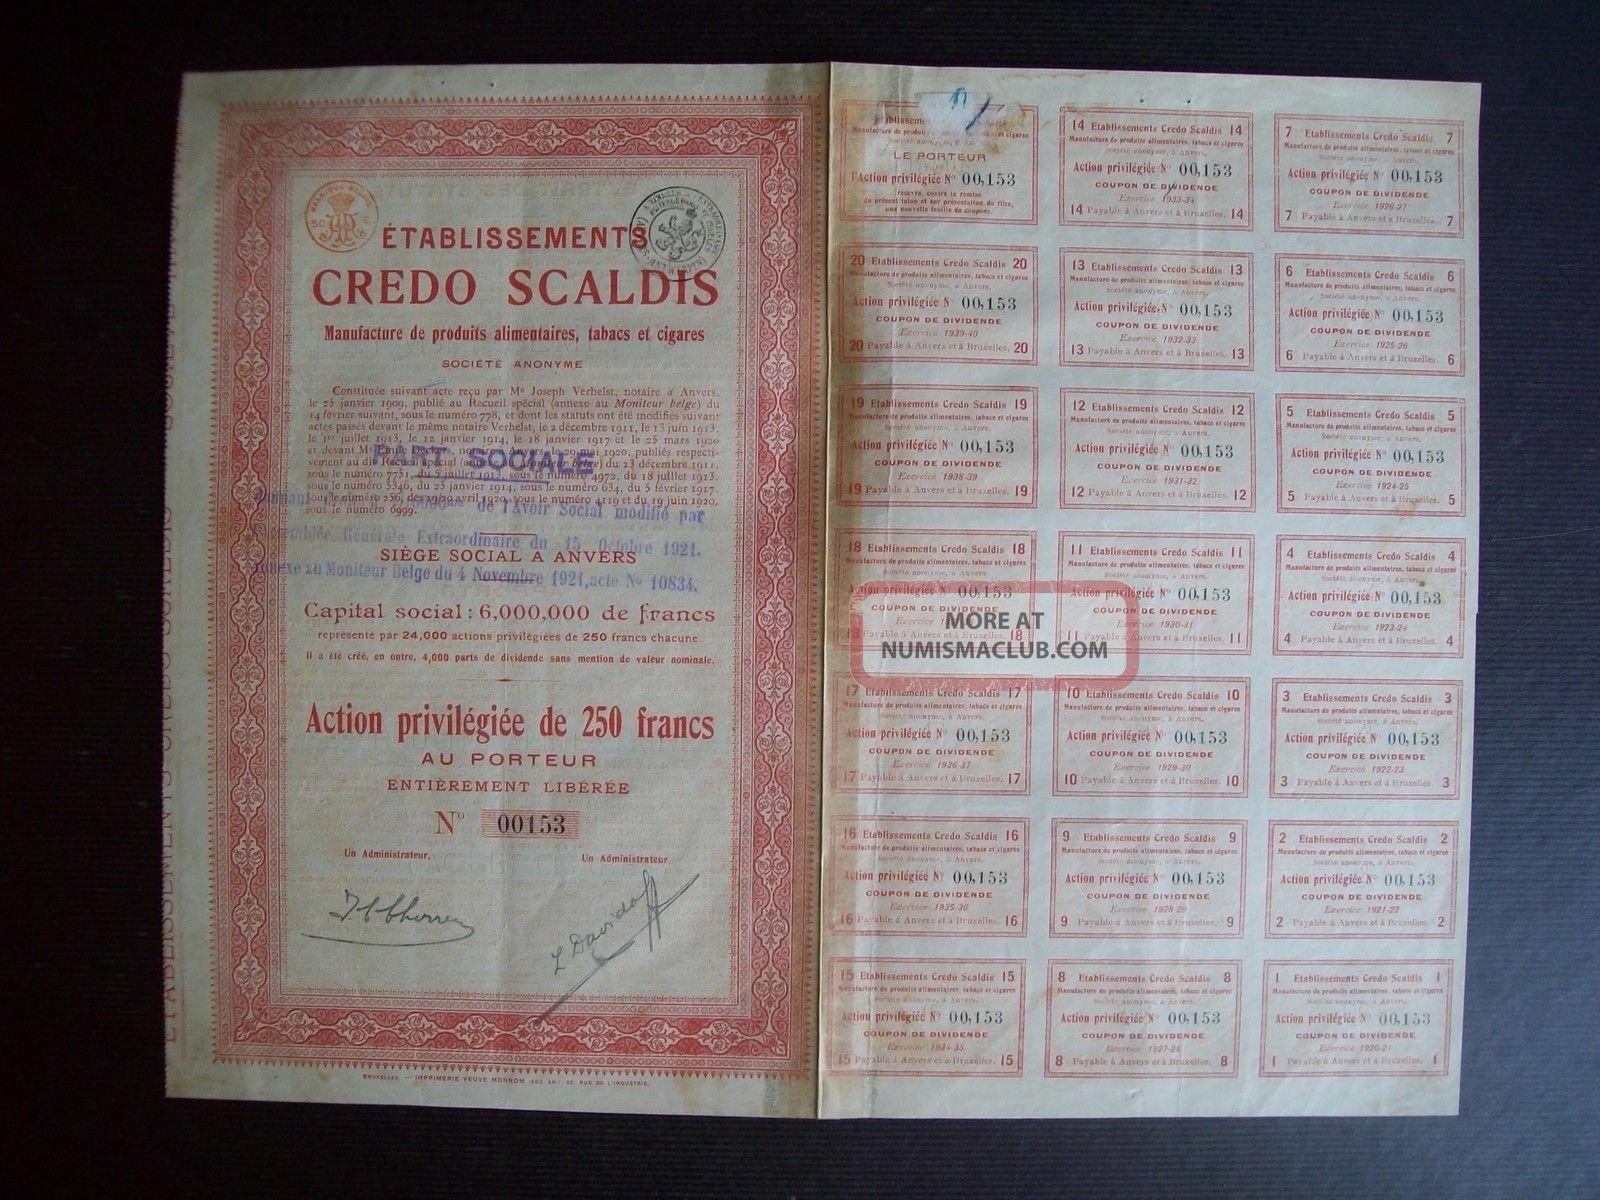 Belgium 1921 Bond - Credo Scaldis Tabacs Cigares Anvers - With Coupons.  A9767 World photo